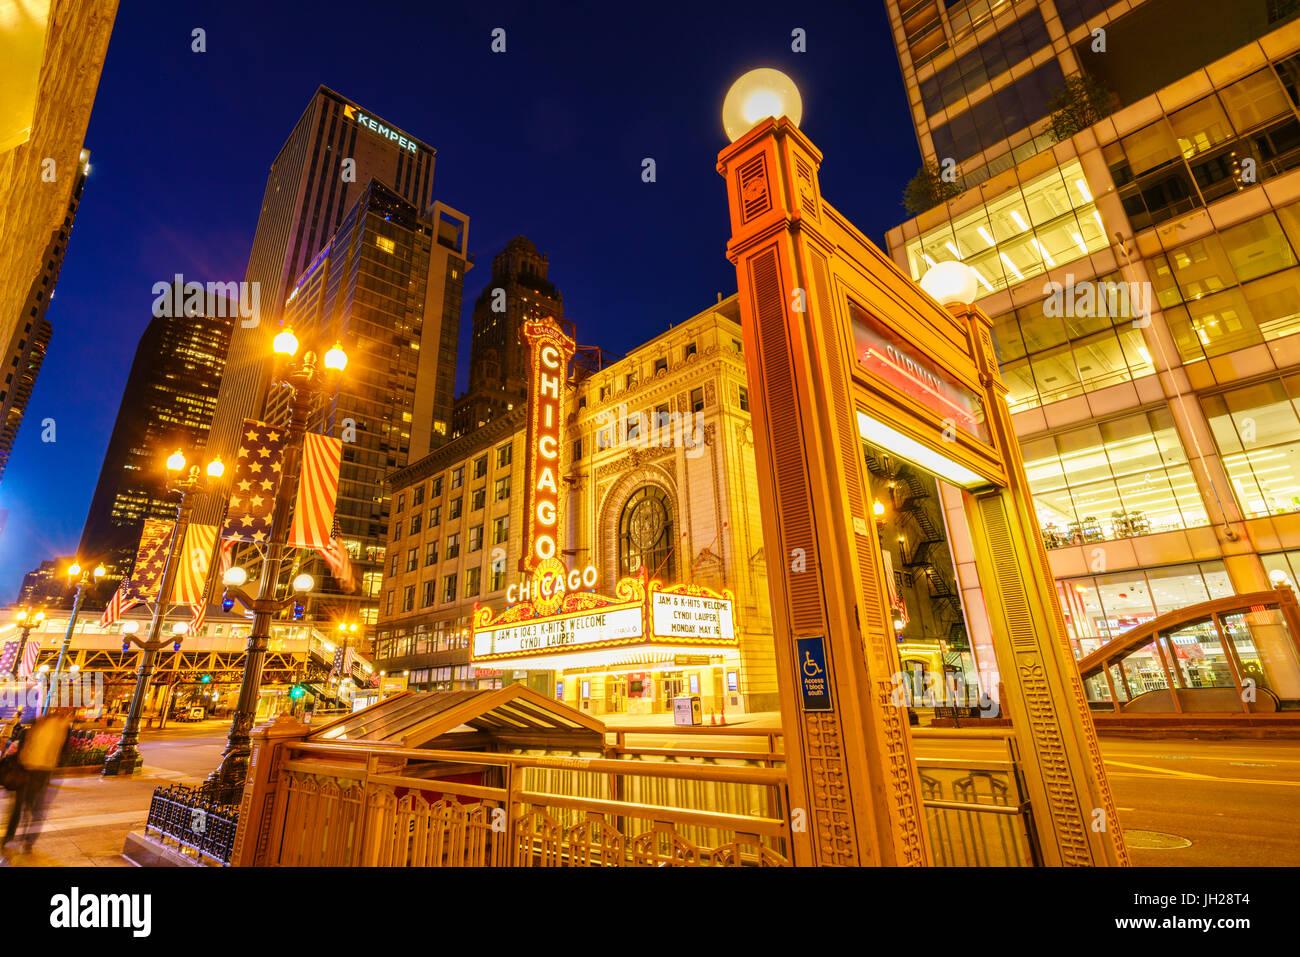 Chicago Theatre, North State Street, Chicago, Illinois, United States of America, North America - Stock Image